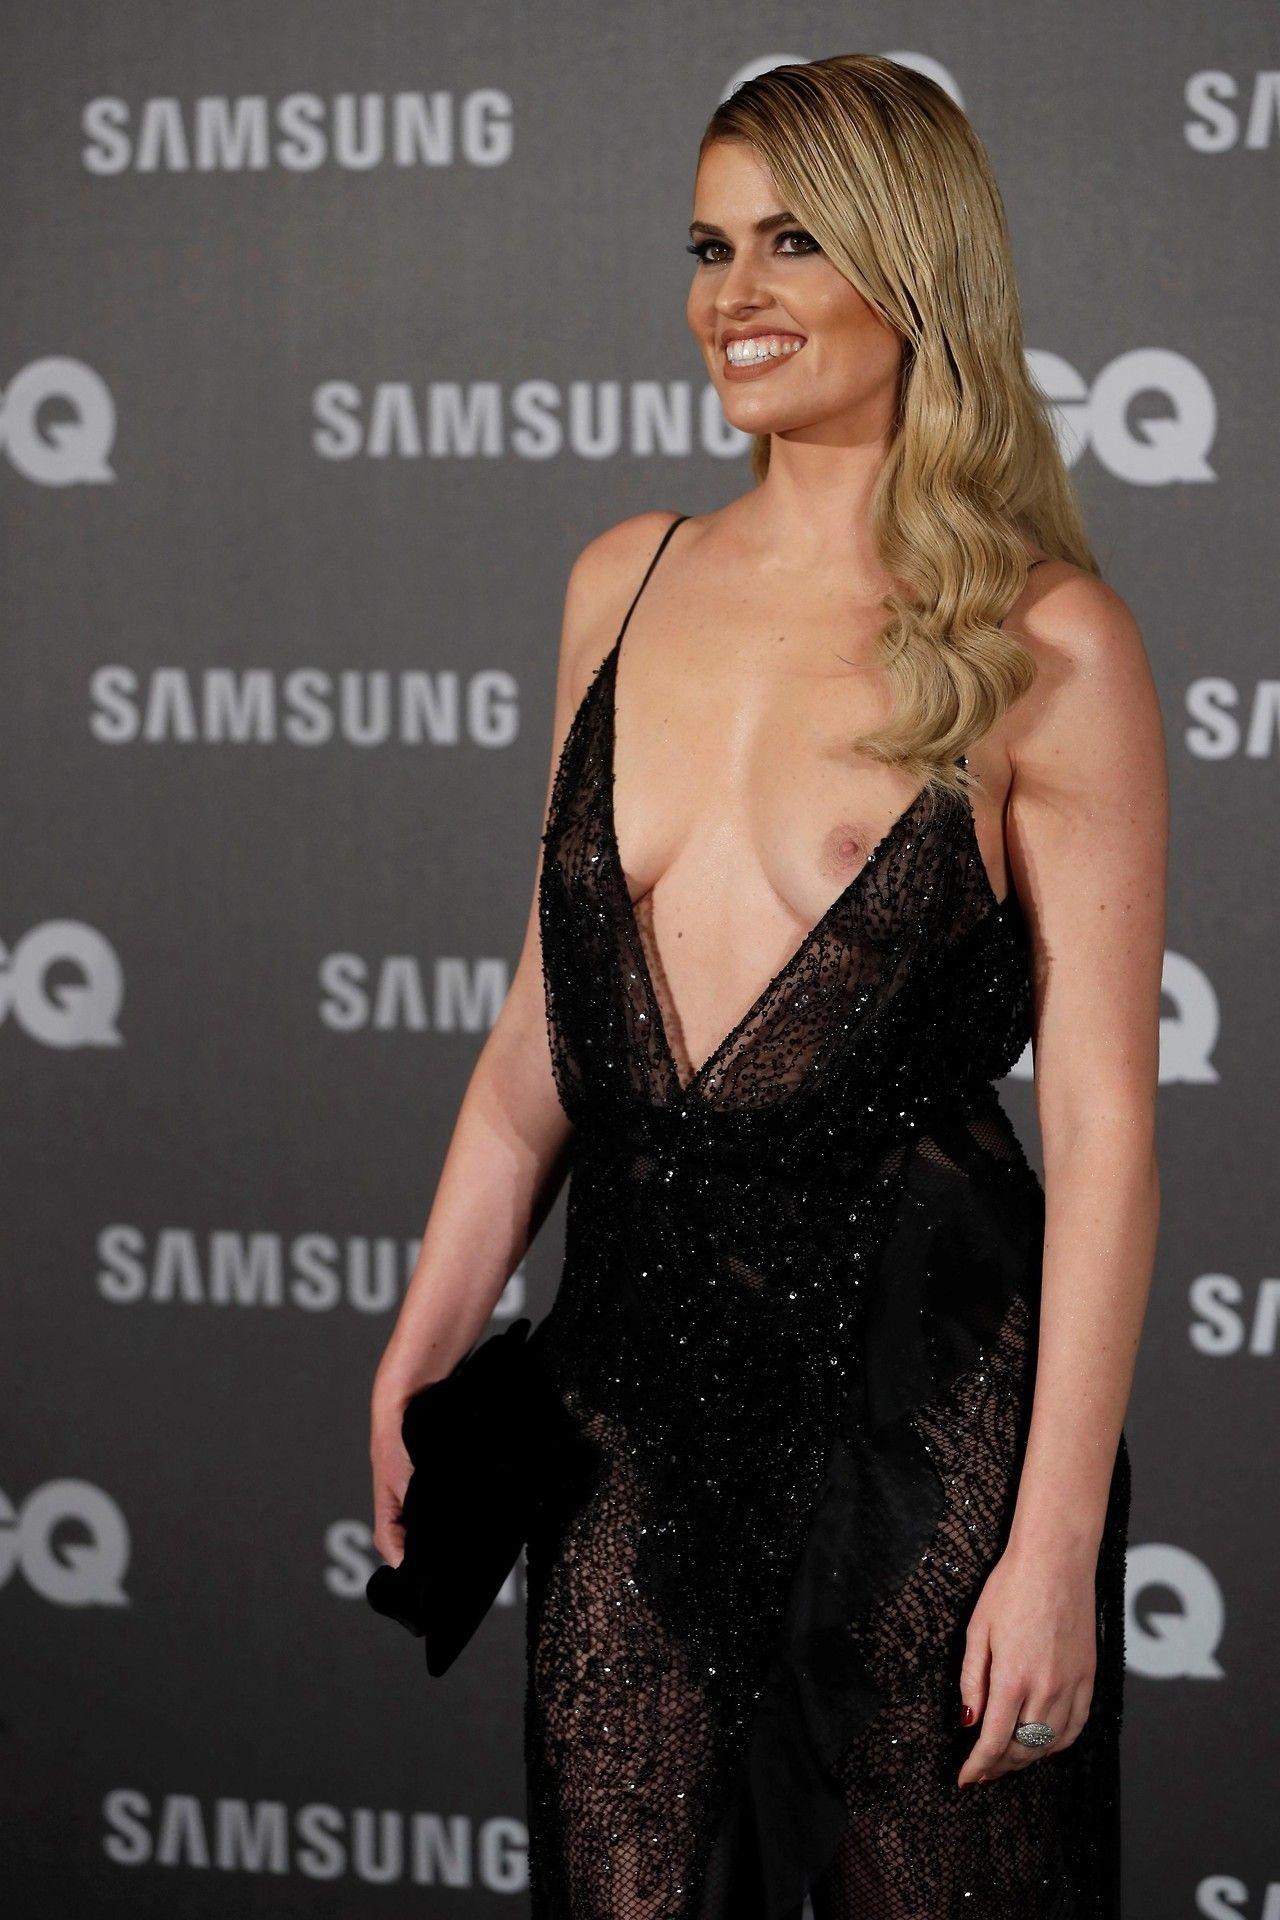 Celebrites Adriana Abenia nudes (27 photos), Topless, Is a cute, Boobs, see through 2020